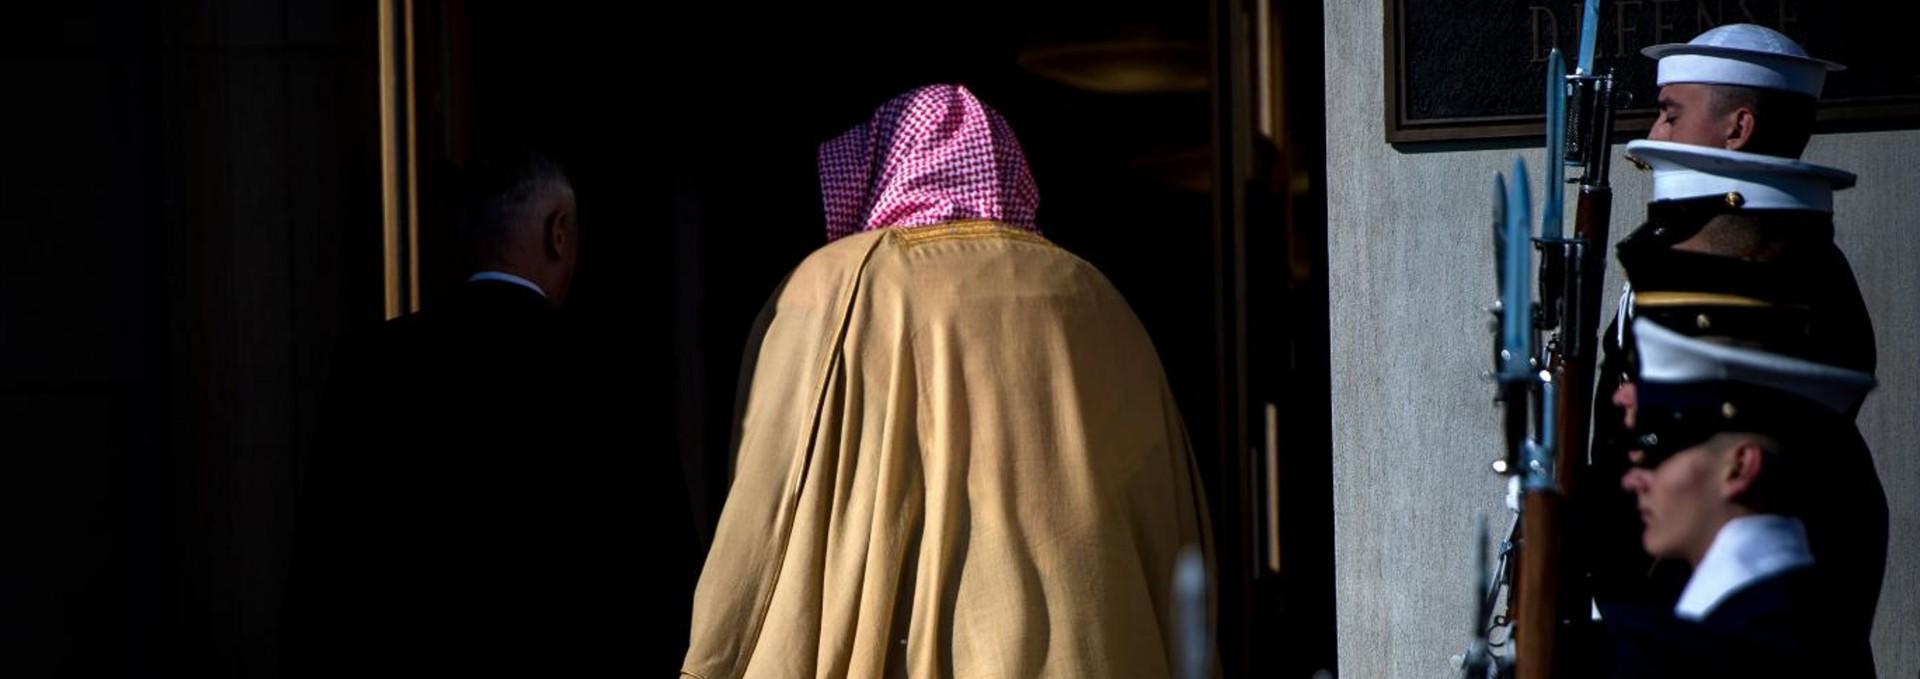 US Secretary of Defense James Mattis (L) and Saudi Arabia's Crown Prince Mohammad Bin Salman walk into the Pentagon after an honor cordon March 22, 2018 in Washington, DC. / AFP PHOTO / Brendan Smialowski